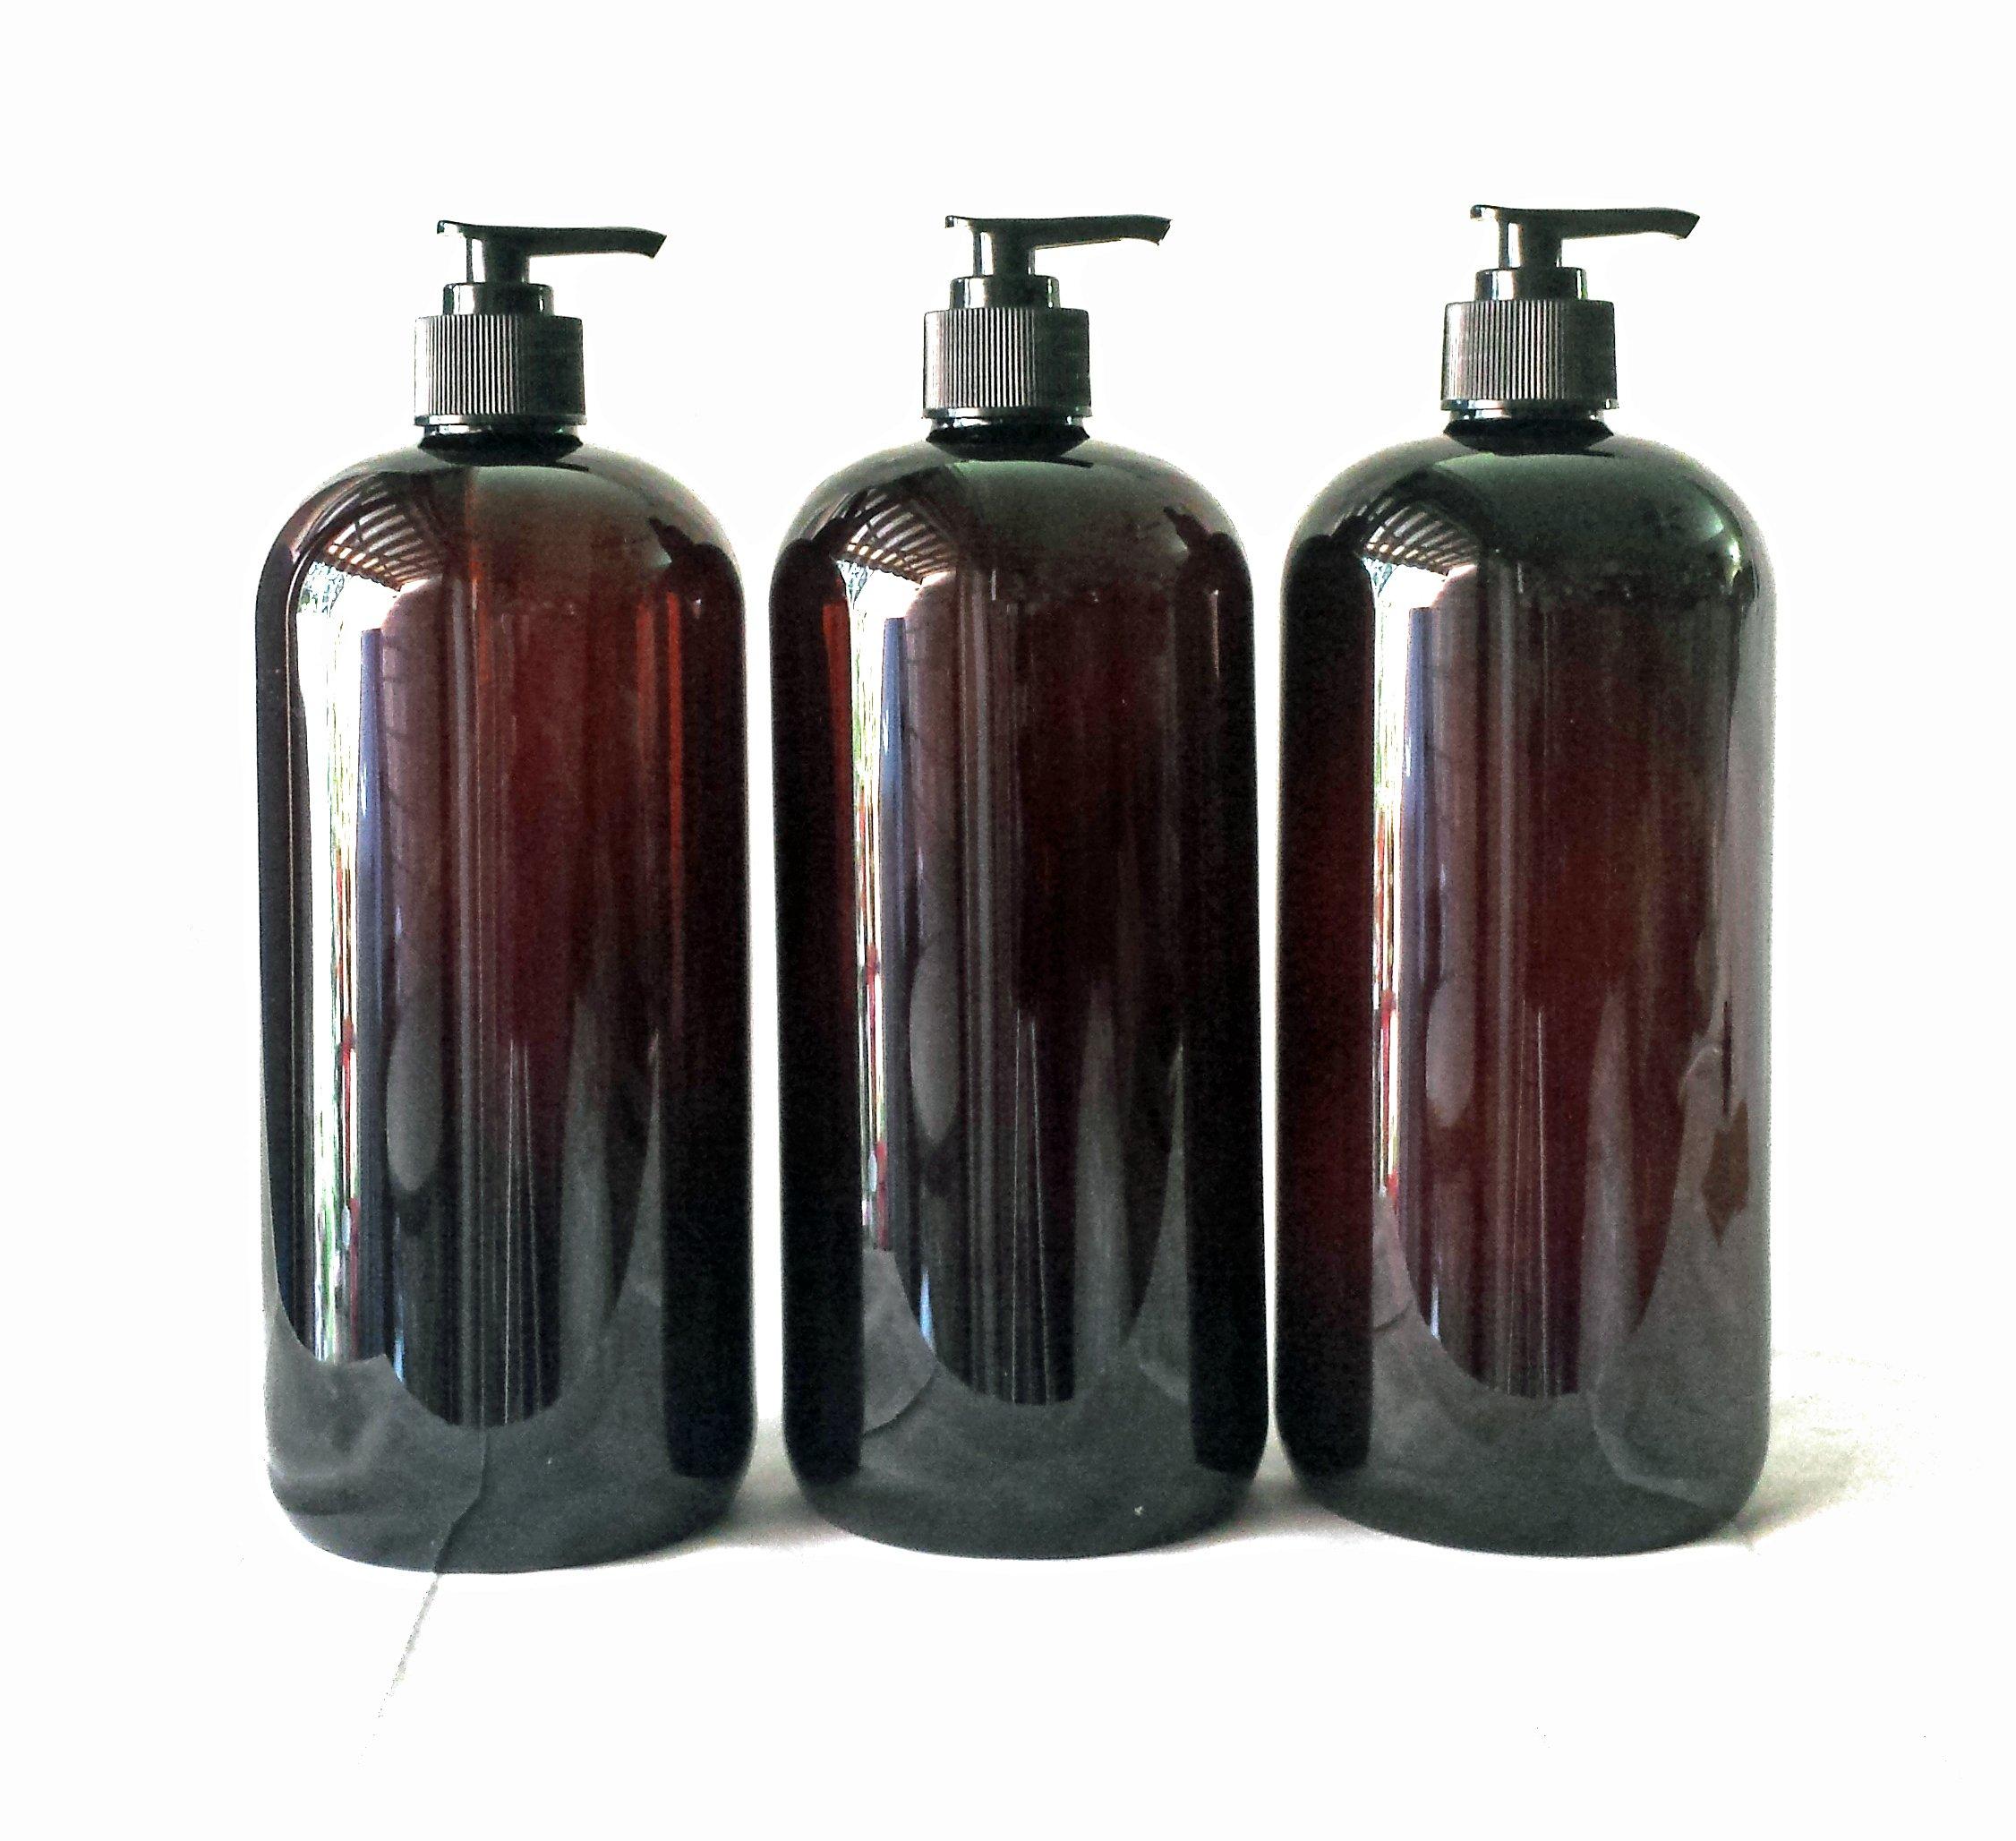 32 oz Amber Plastic PET Plastic Bottle with Black Hand Lotion Pump and Kraft Labels (3)